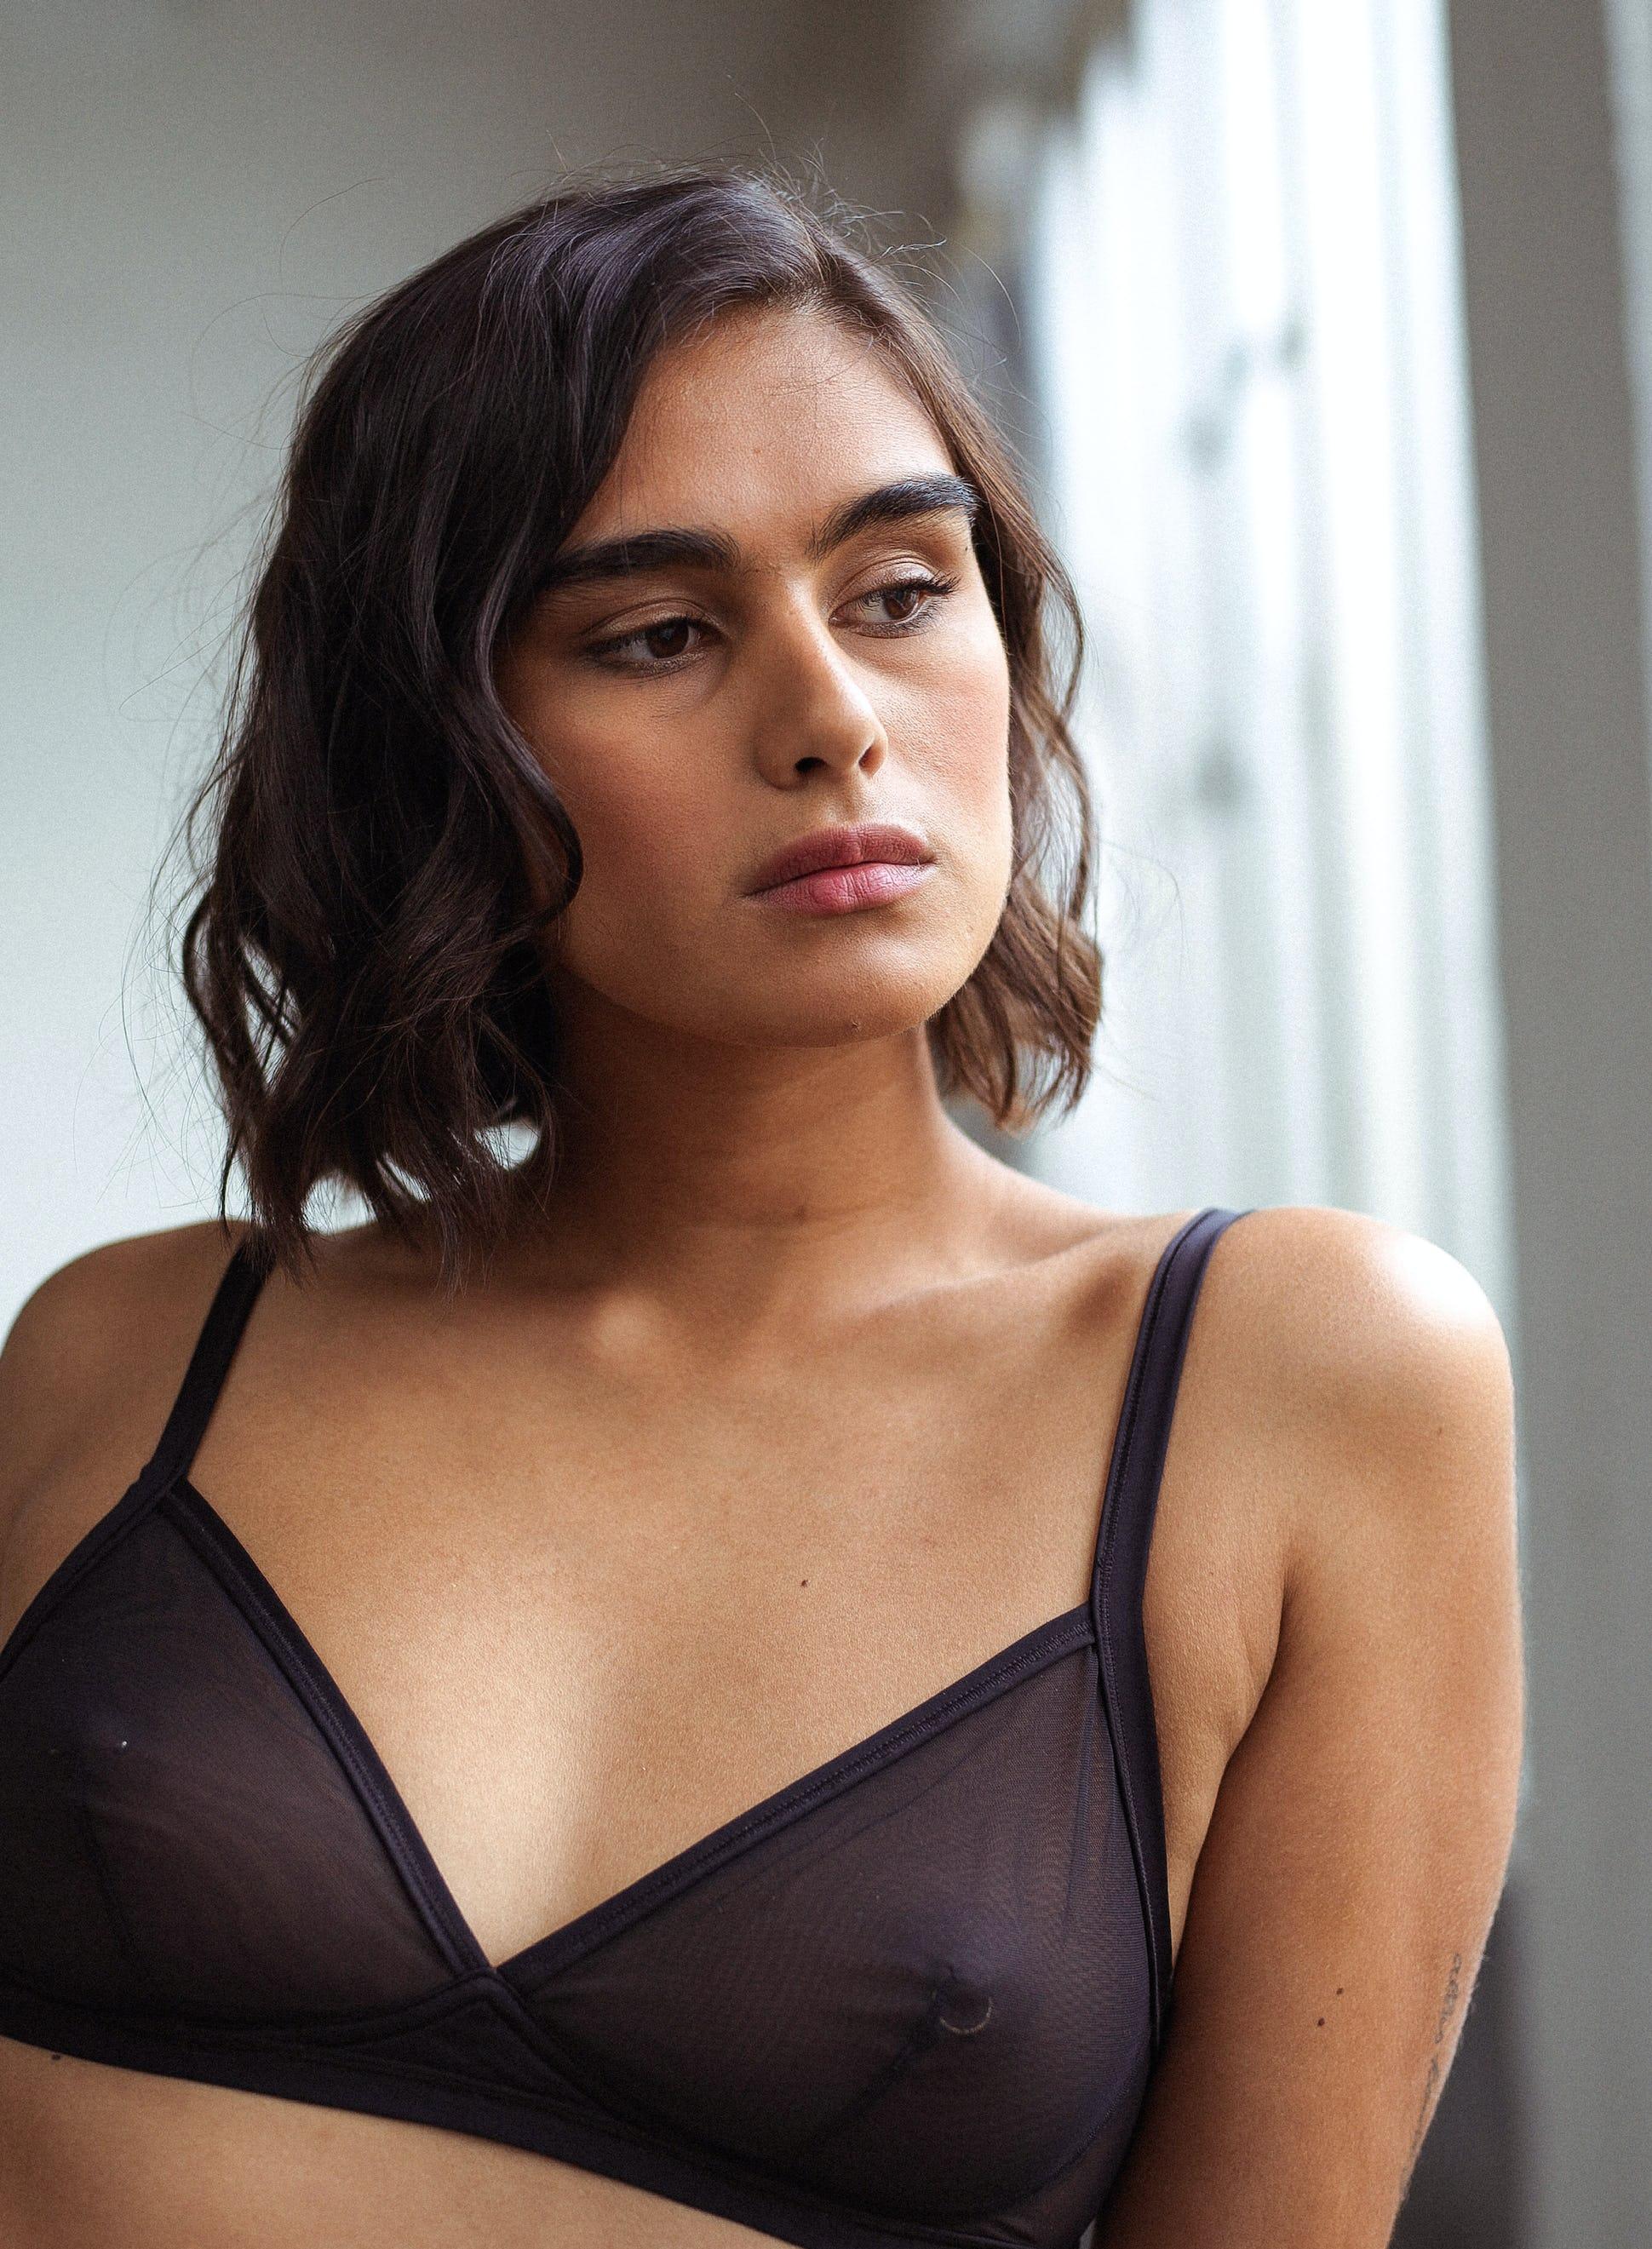 Triangle bra Histoire de femmes in black